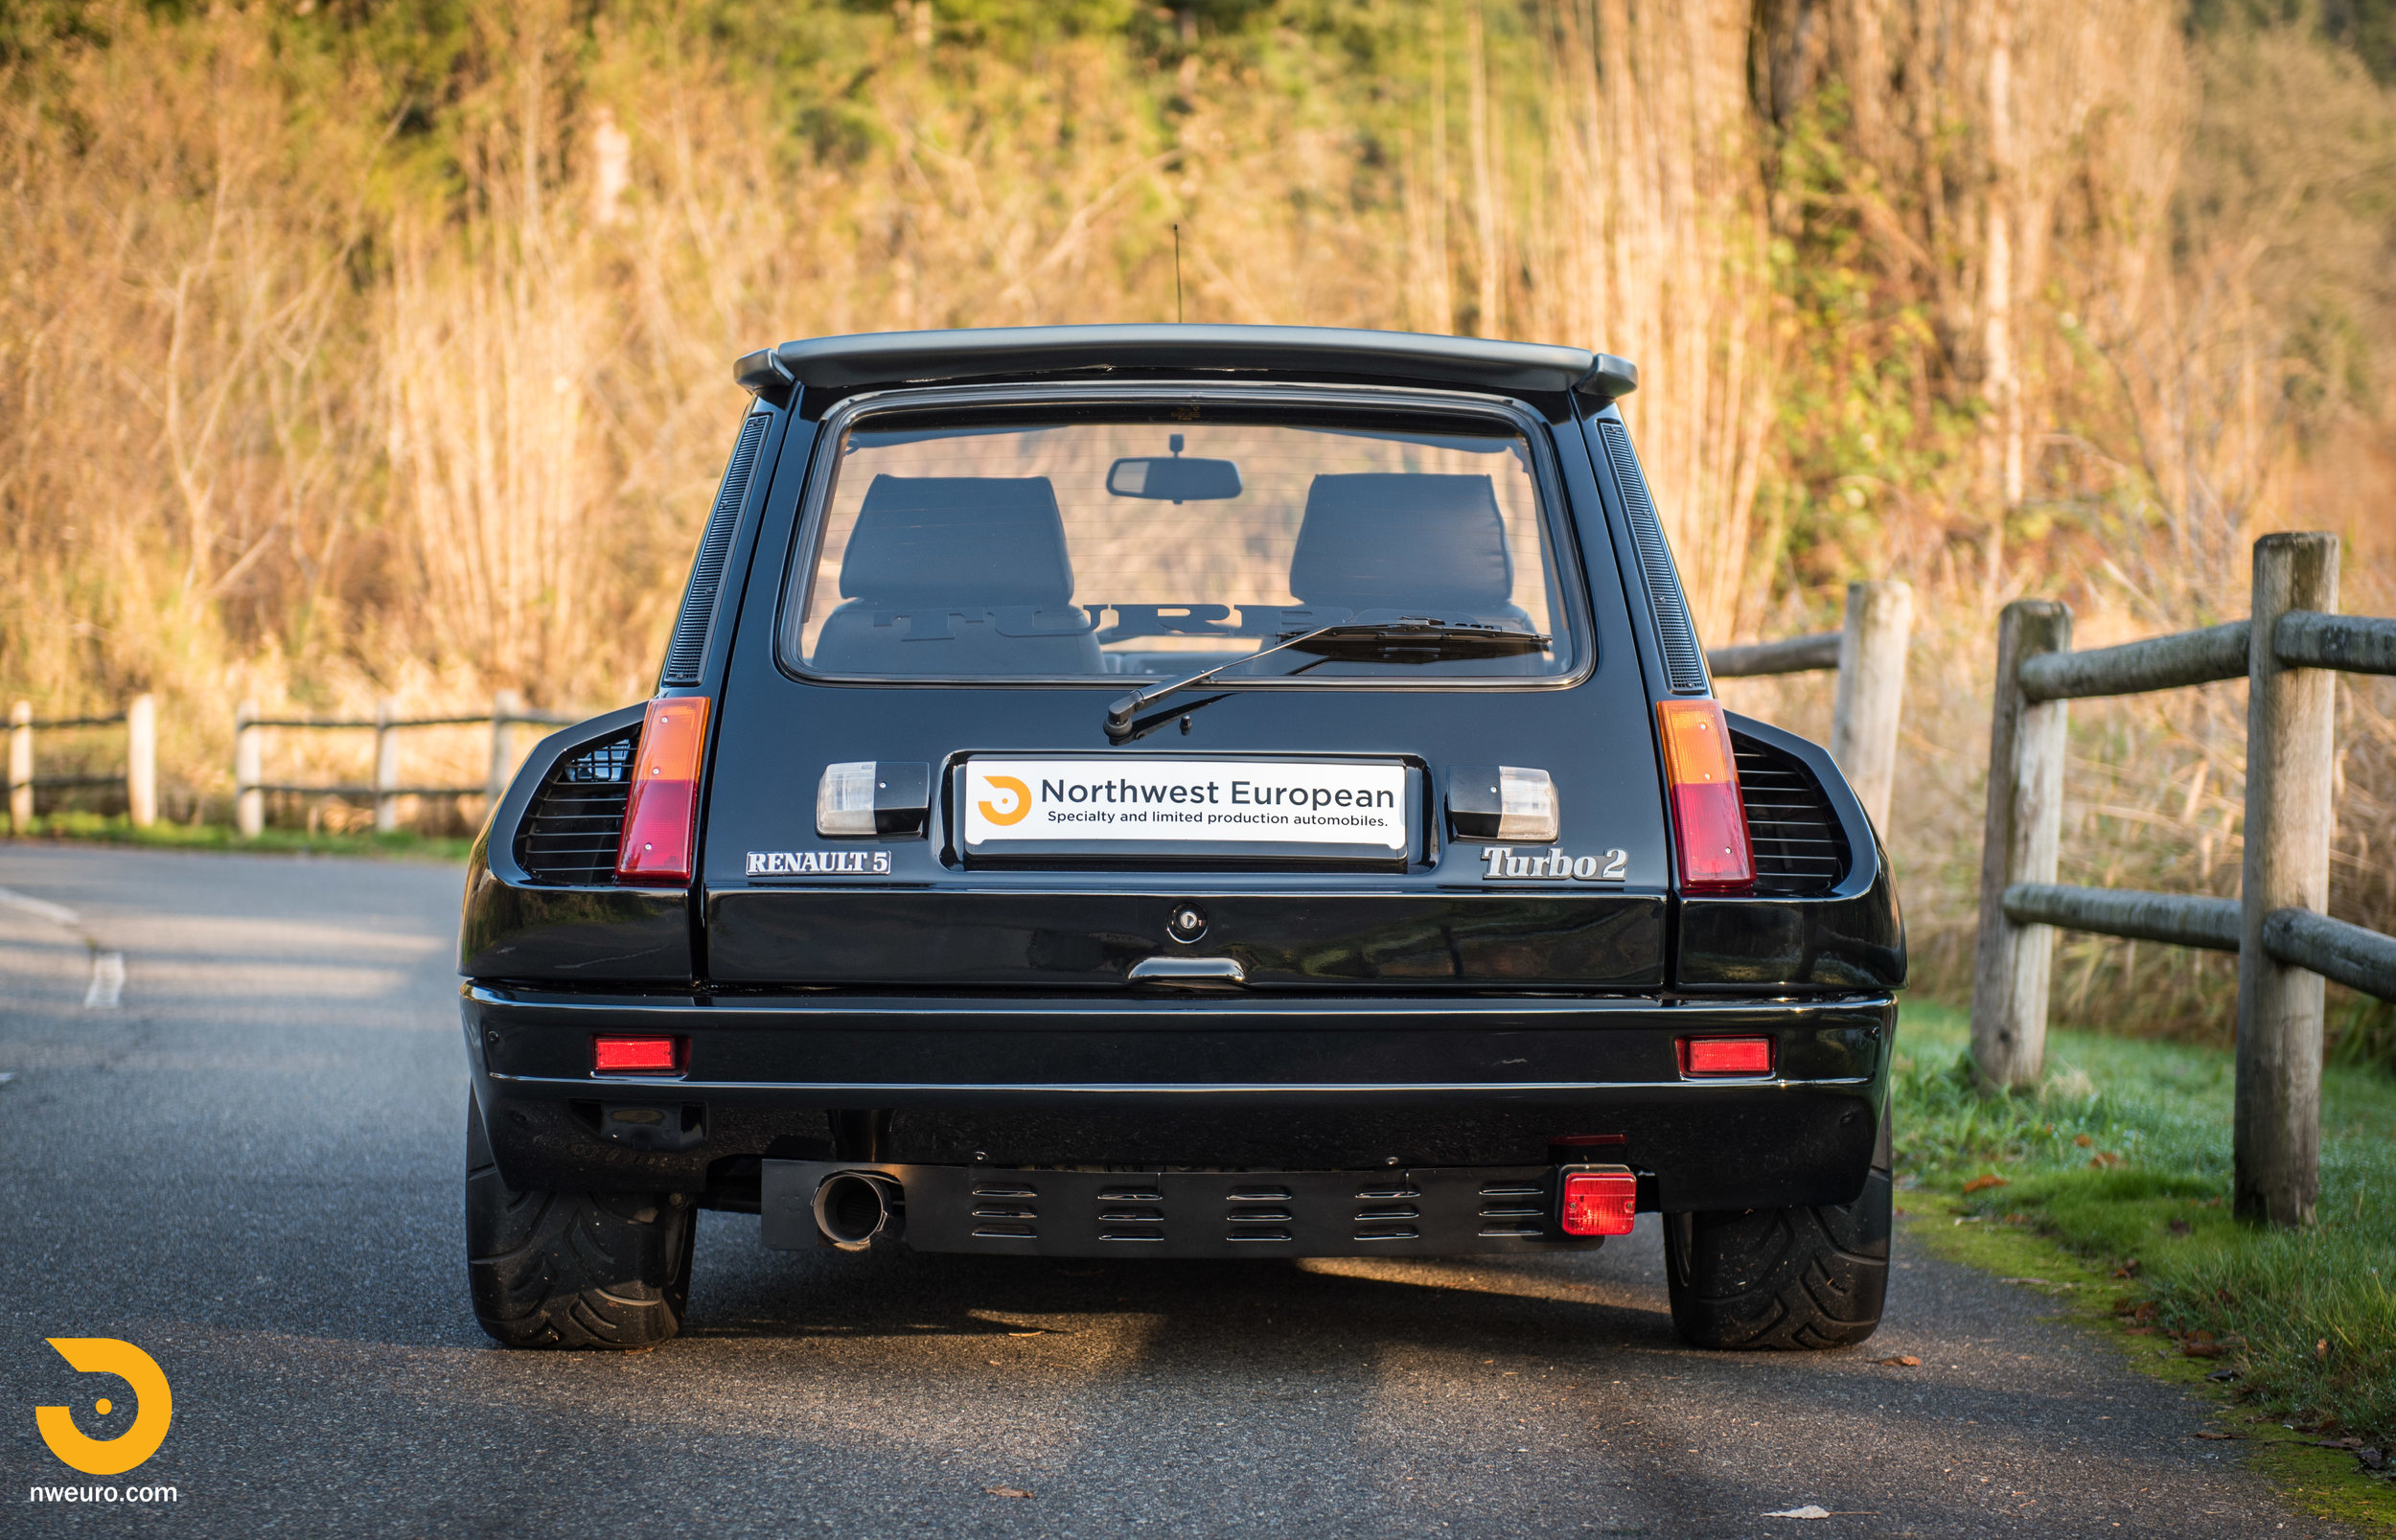 1983 Renault R5 Turbo 2 Black at Park-15.jpg